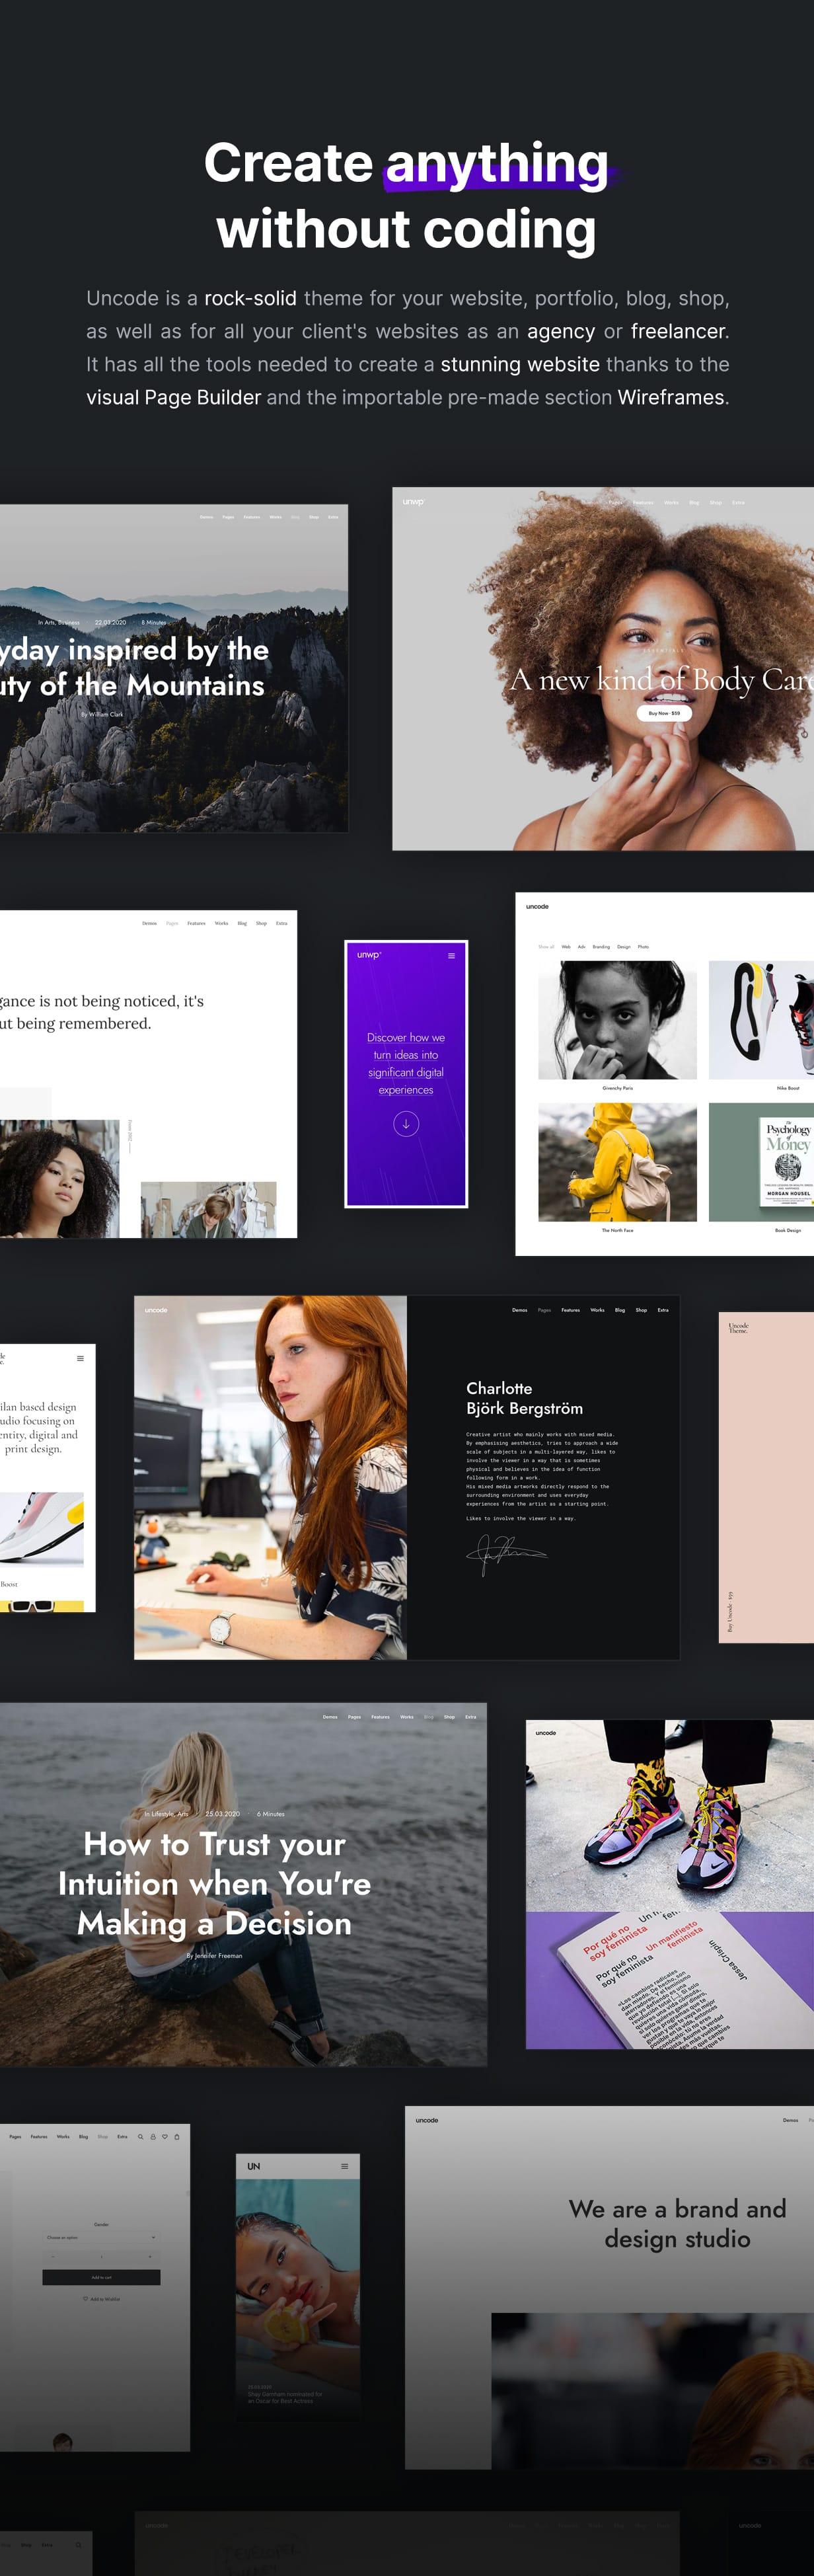 Uncode - Creative Multiuse & WooCommerce WordPress Theme - Website Builder